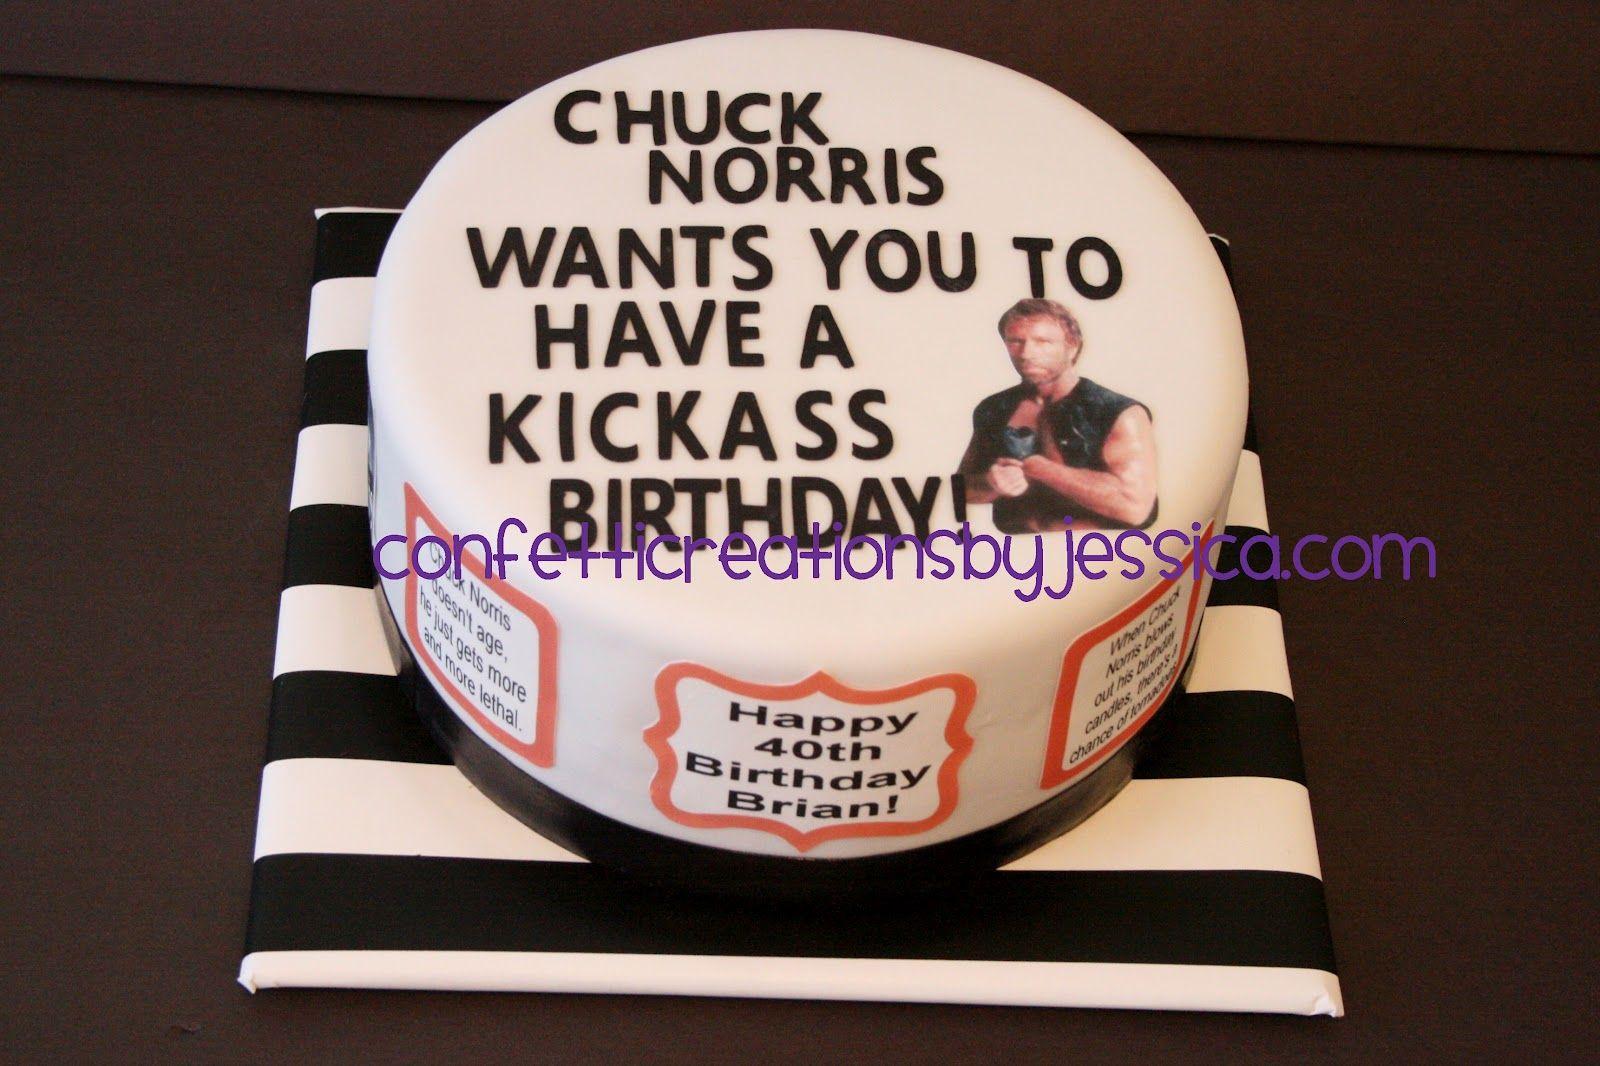 Tremendous Chuck Norris Birthday Cake 01 With Images Chuck Norris Funny Birthday Cards Online Alyptdamsfinfo